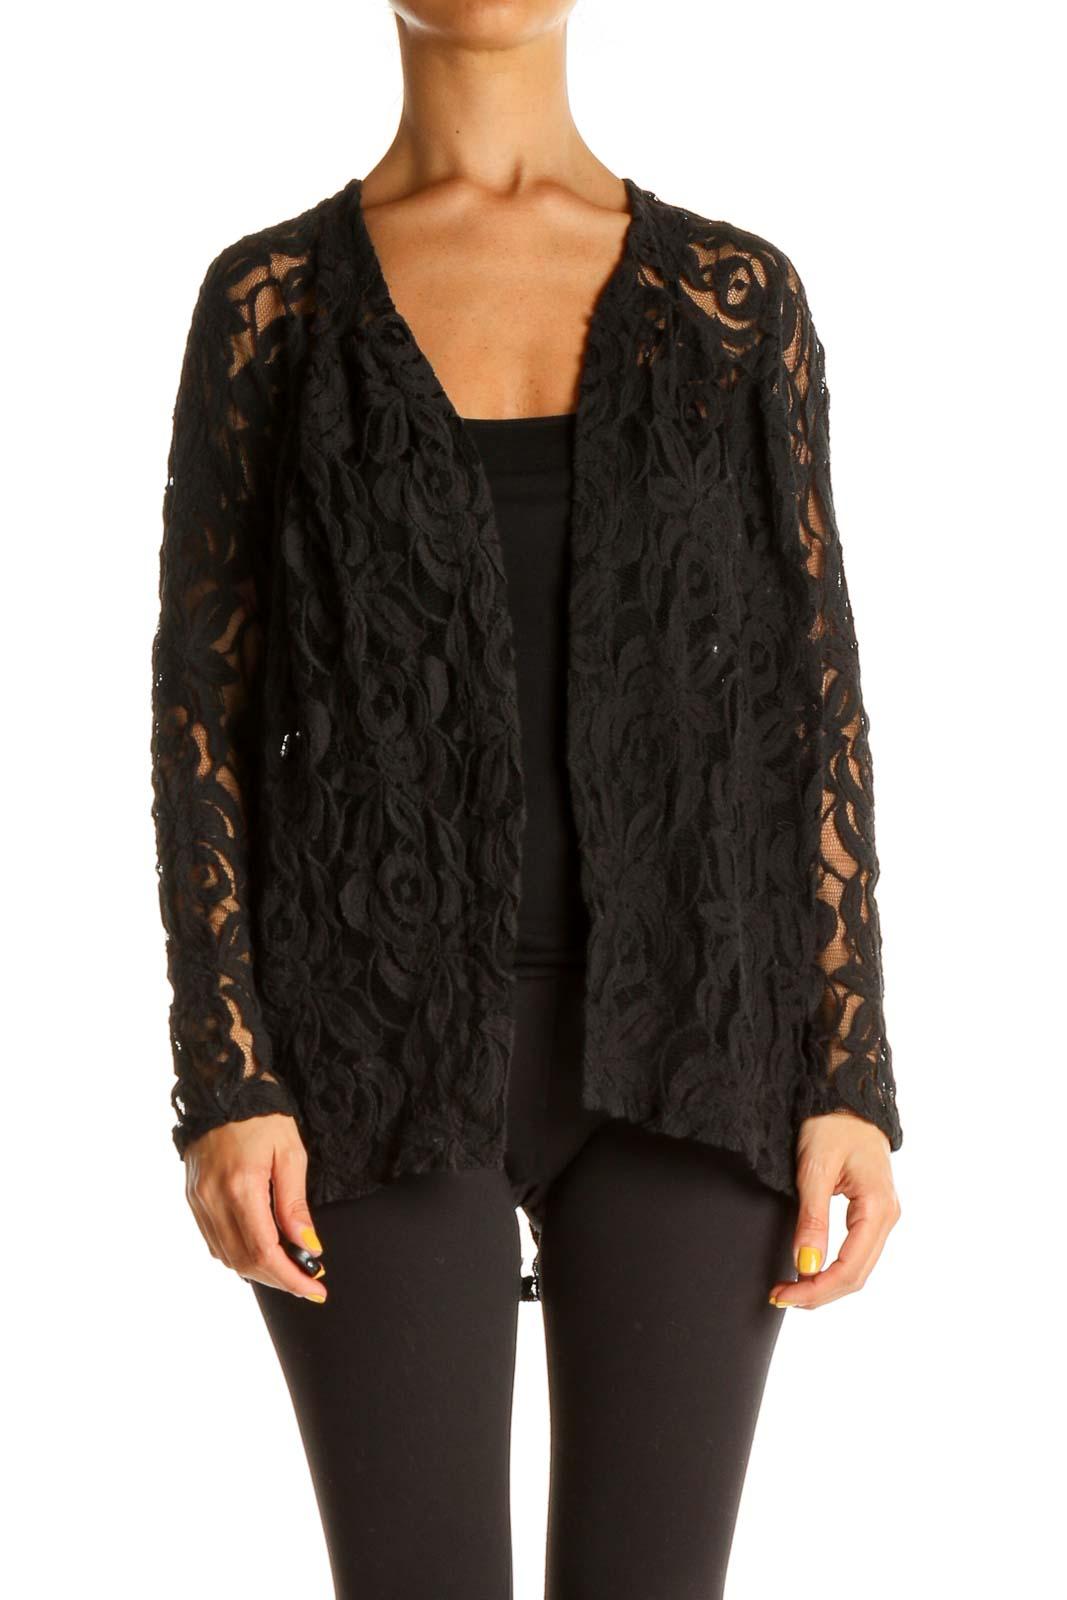 Black Lace Cardigan Front